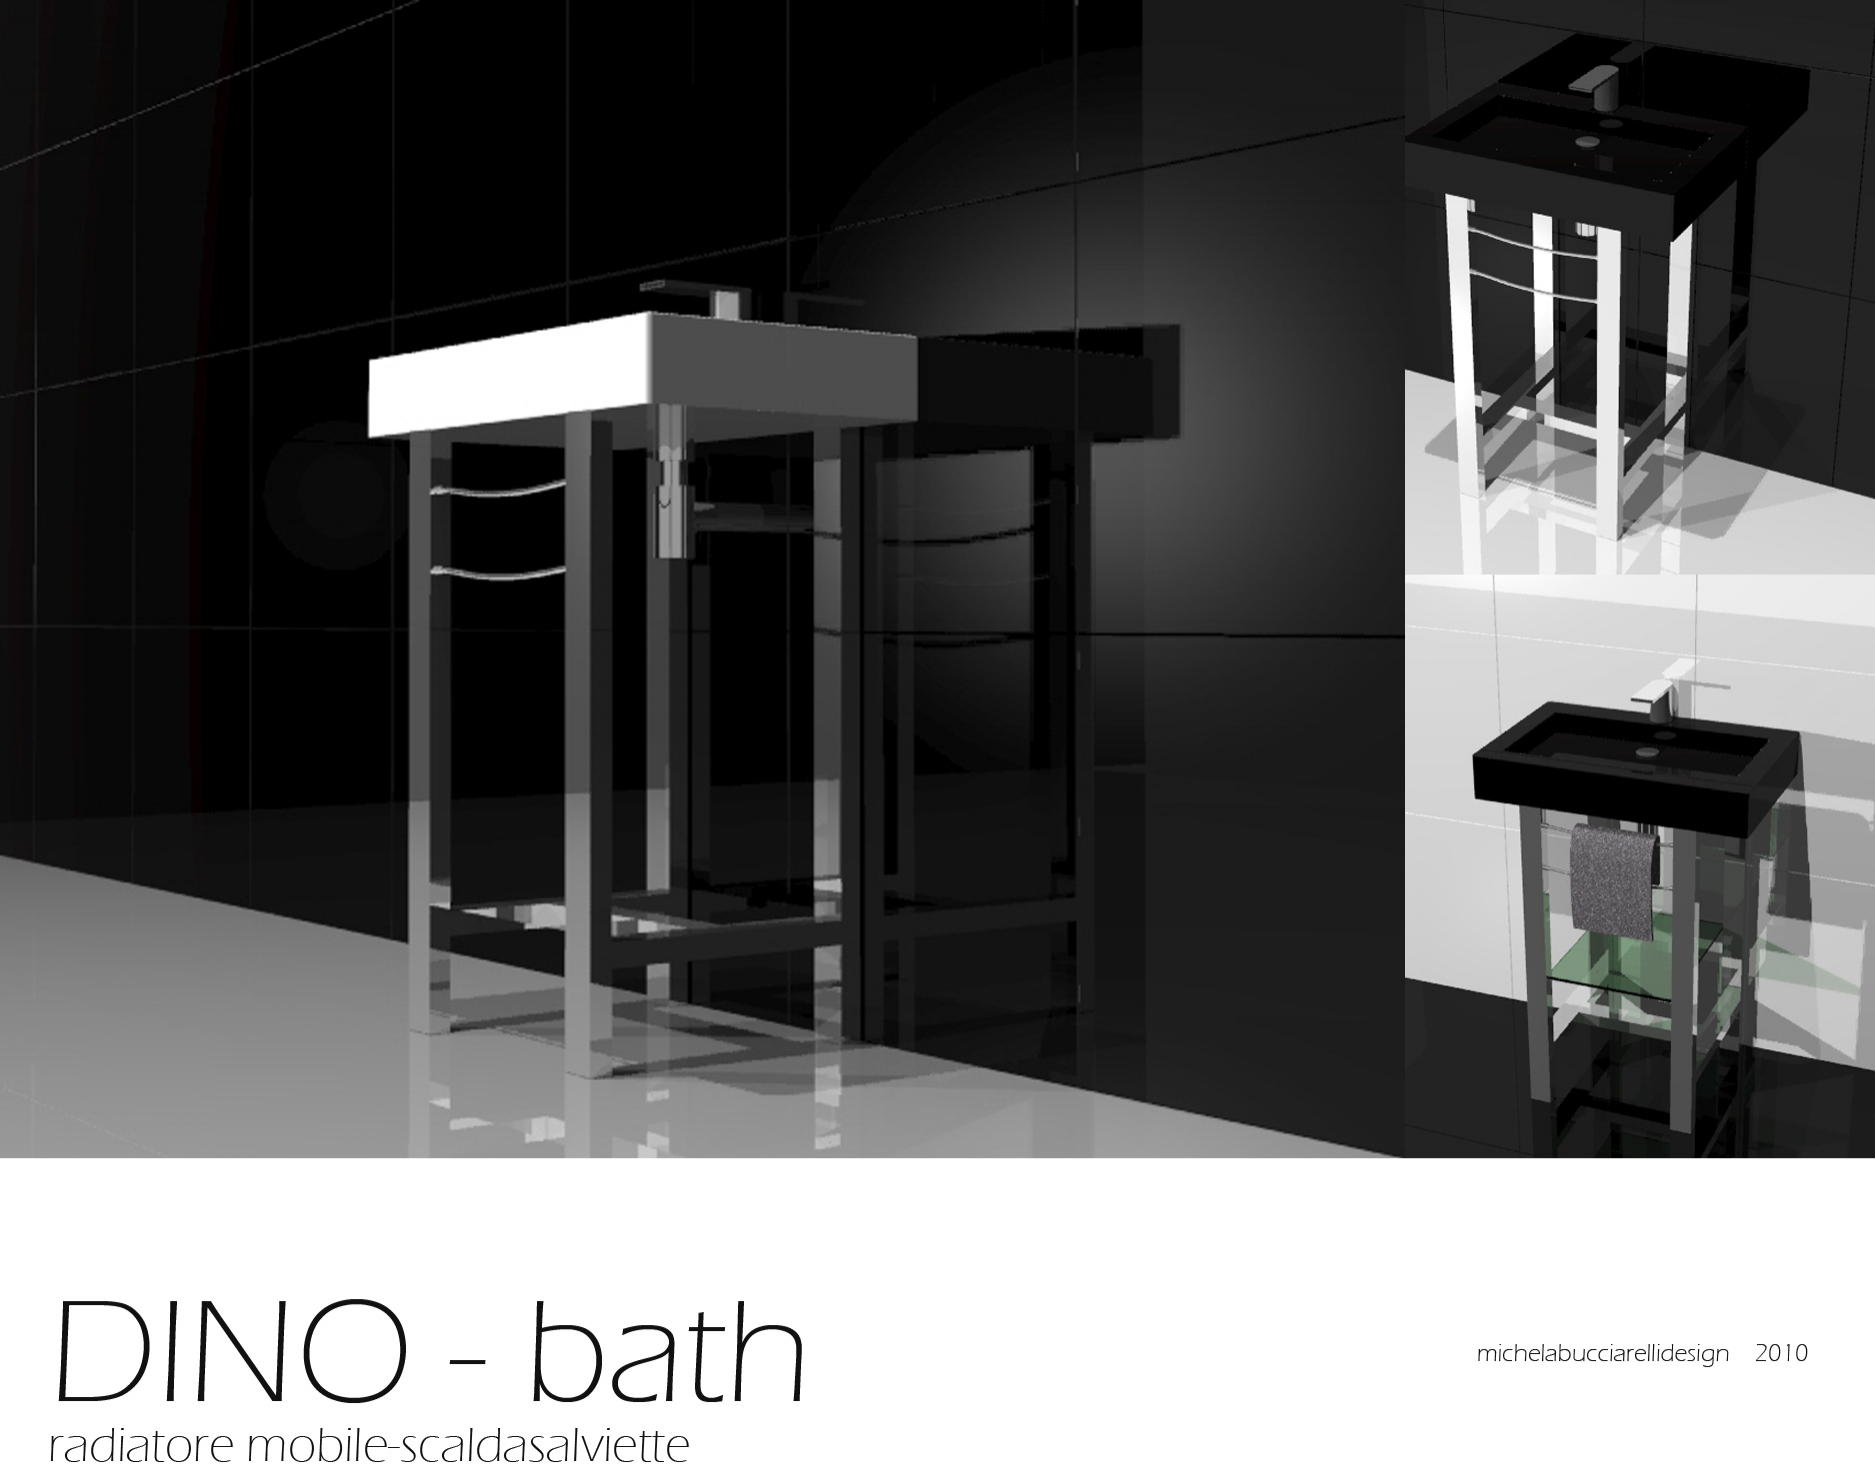 Dino - Studio radiatore arredobagno 2008 -2010 ADHOC Gruppo Ragaini   rendering.